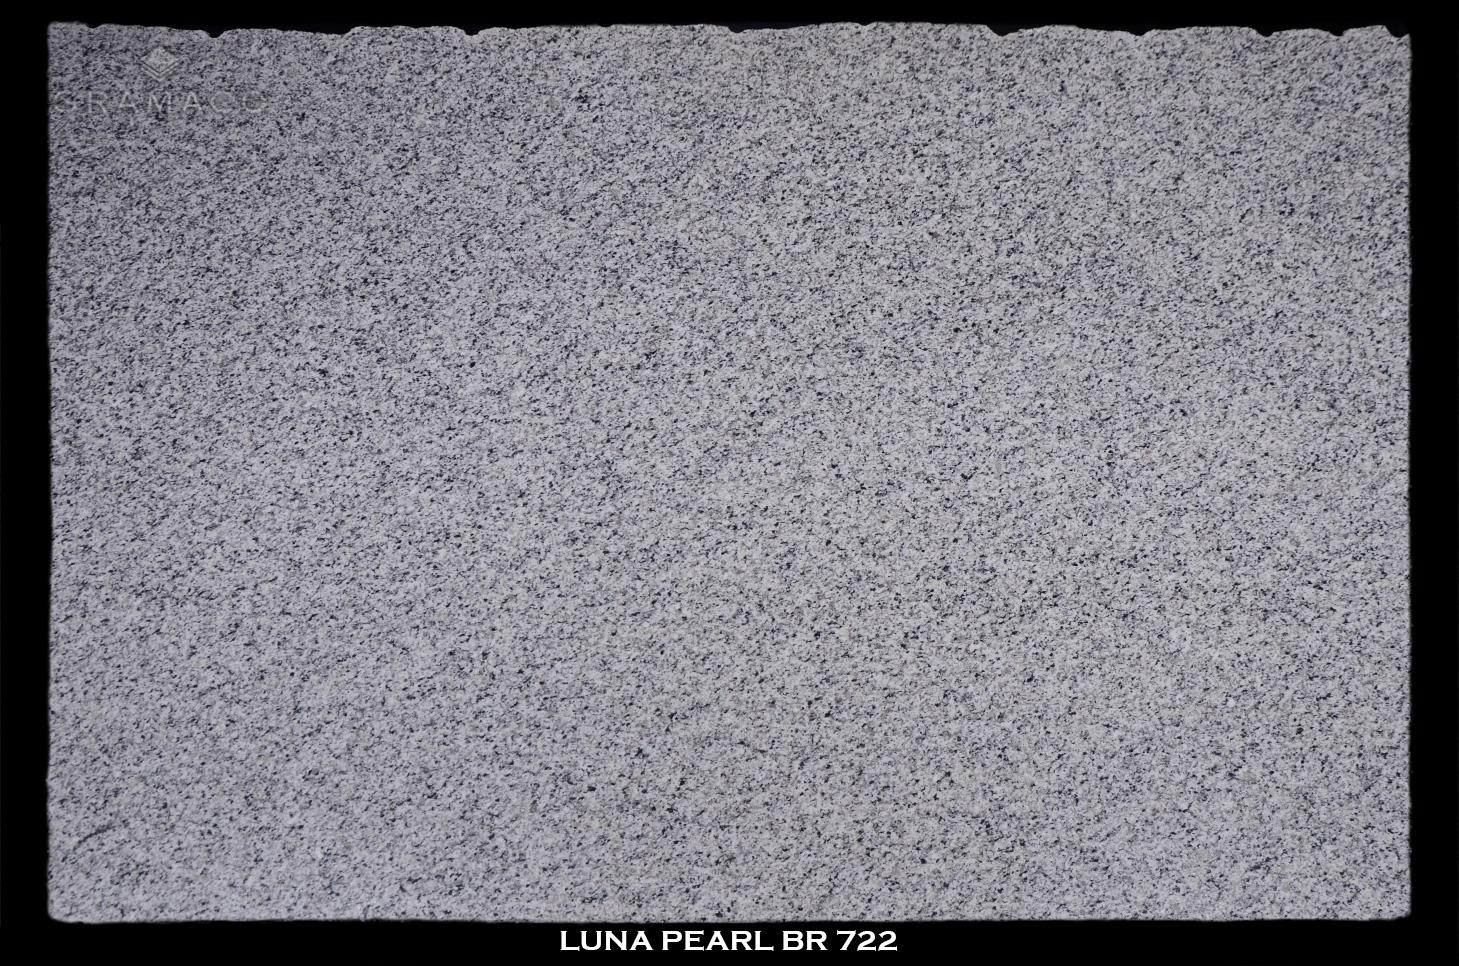 LUNA-PEARL-BR-722---FULL-SLAB-BLACK